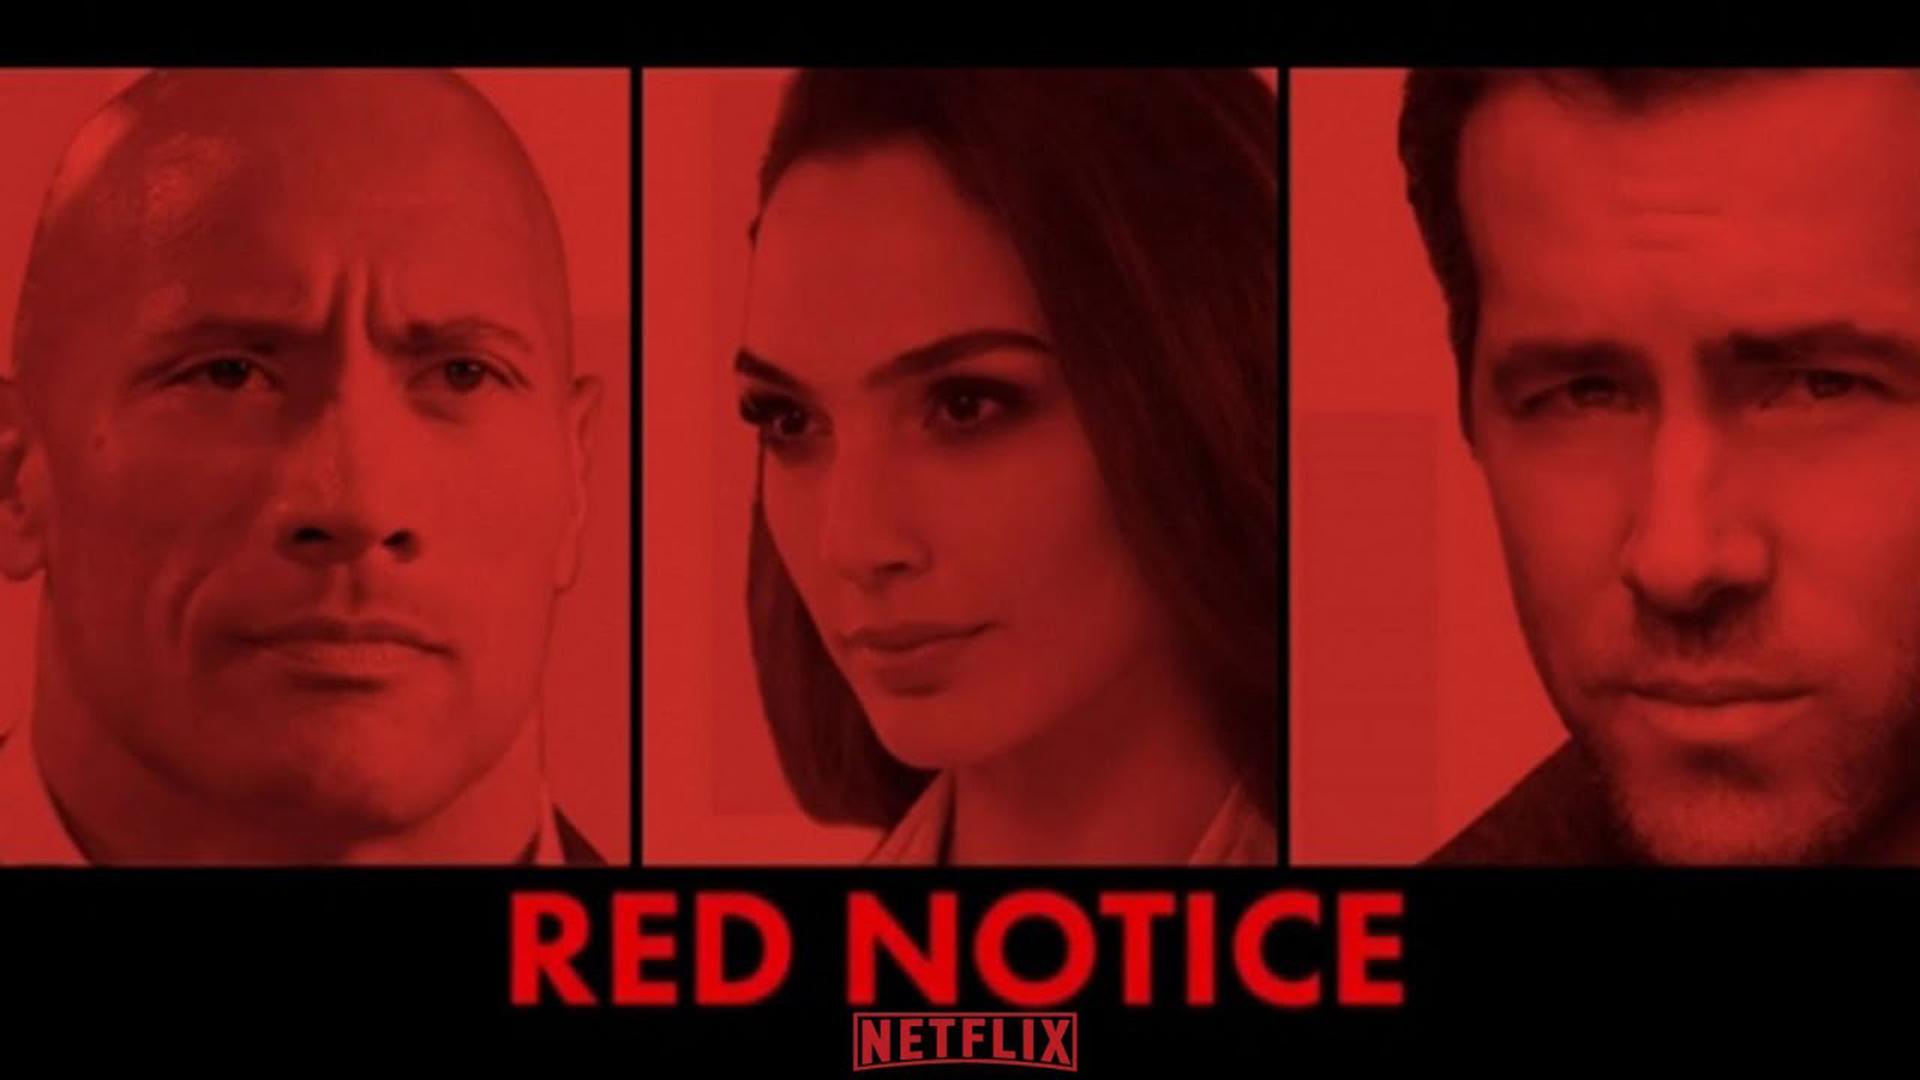 Netflix Red Notice Poster 2021 Wallpaper, HD Movies 4K ...